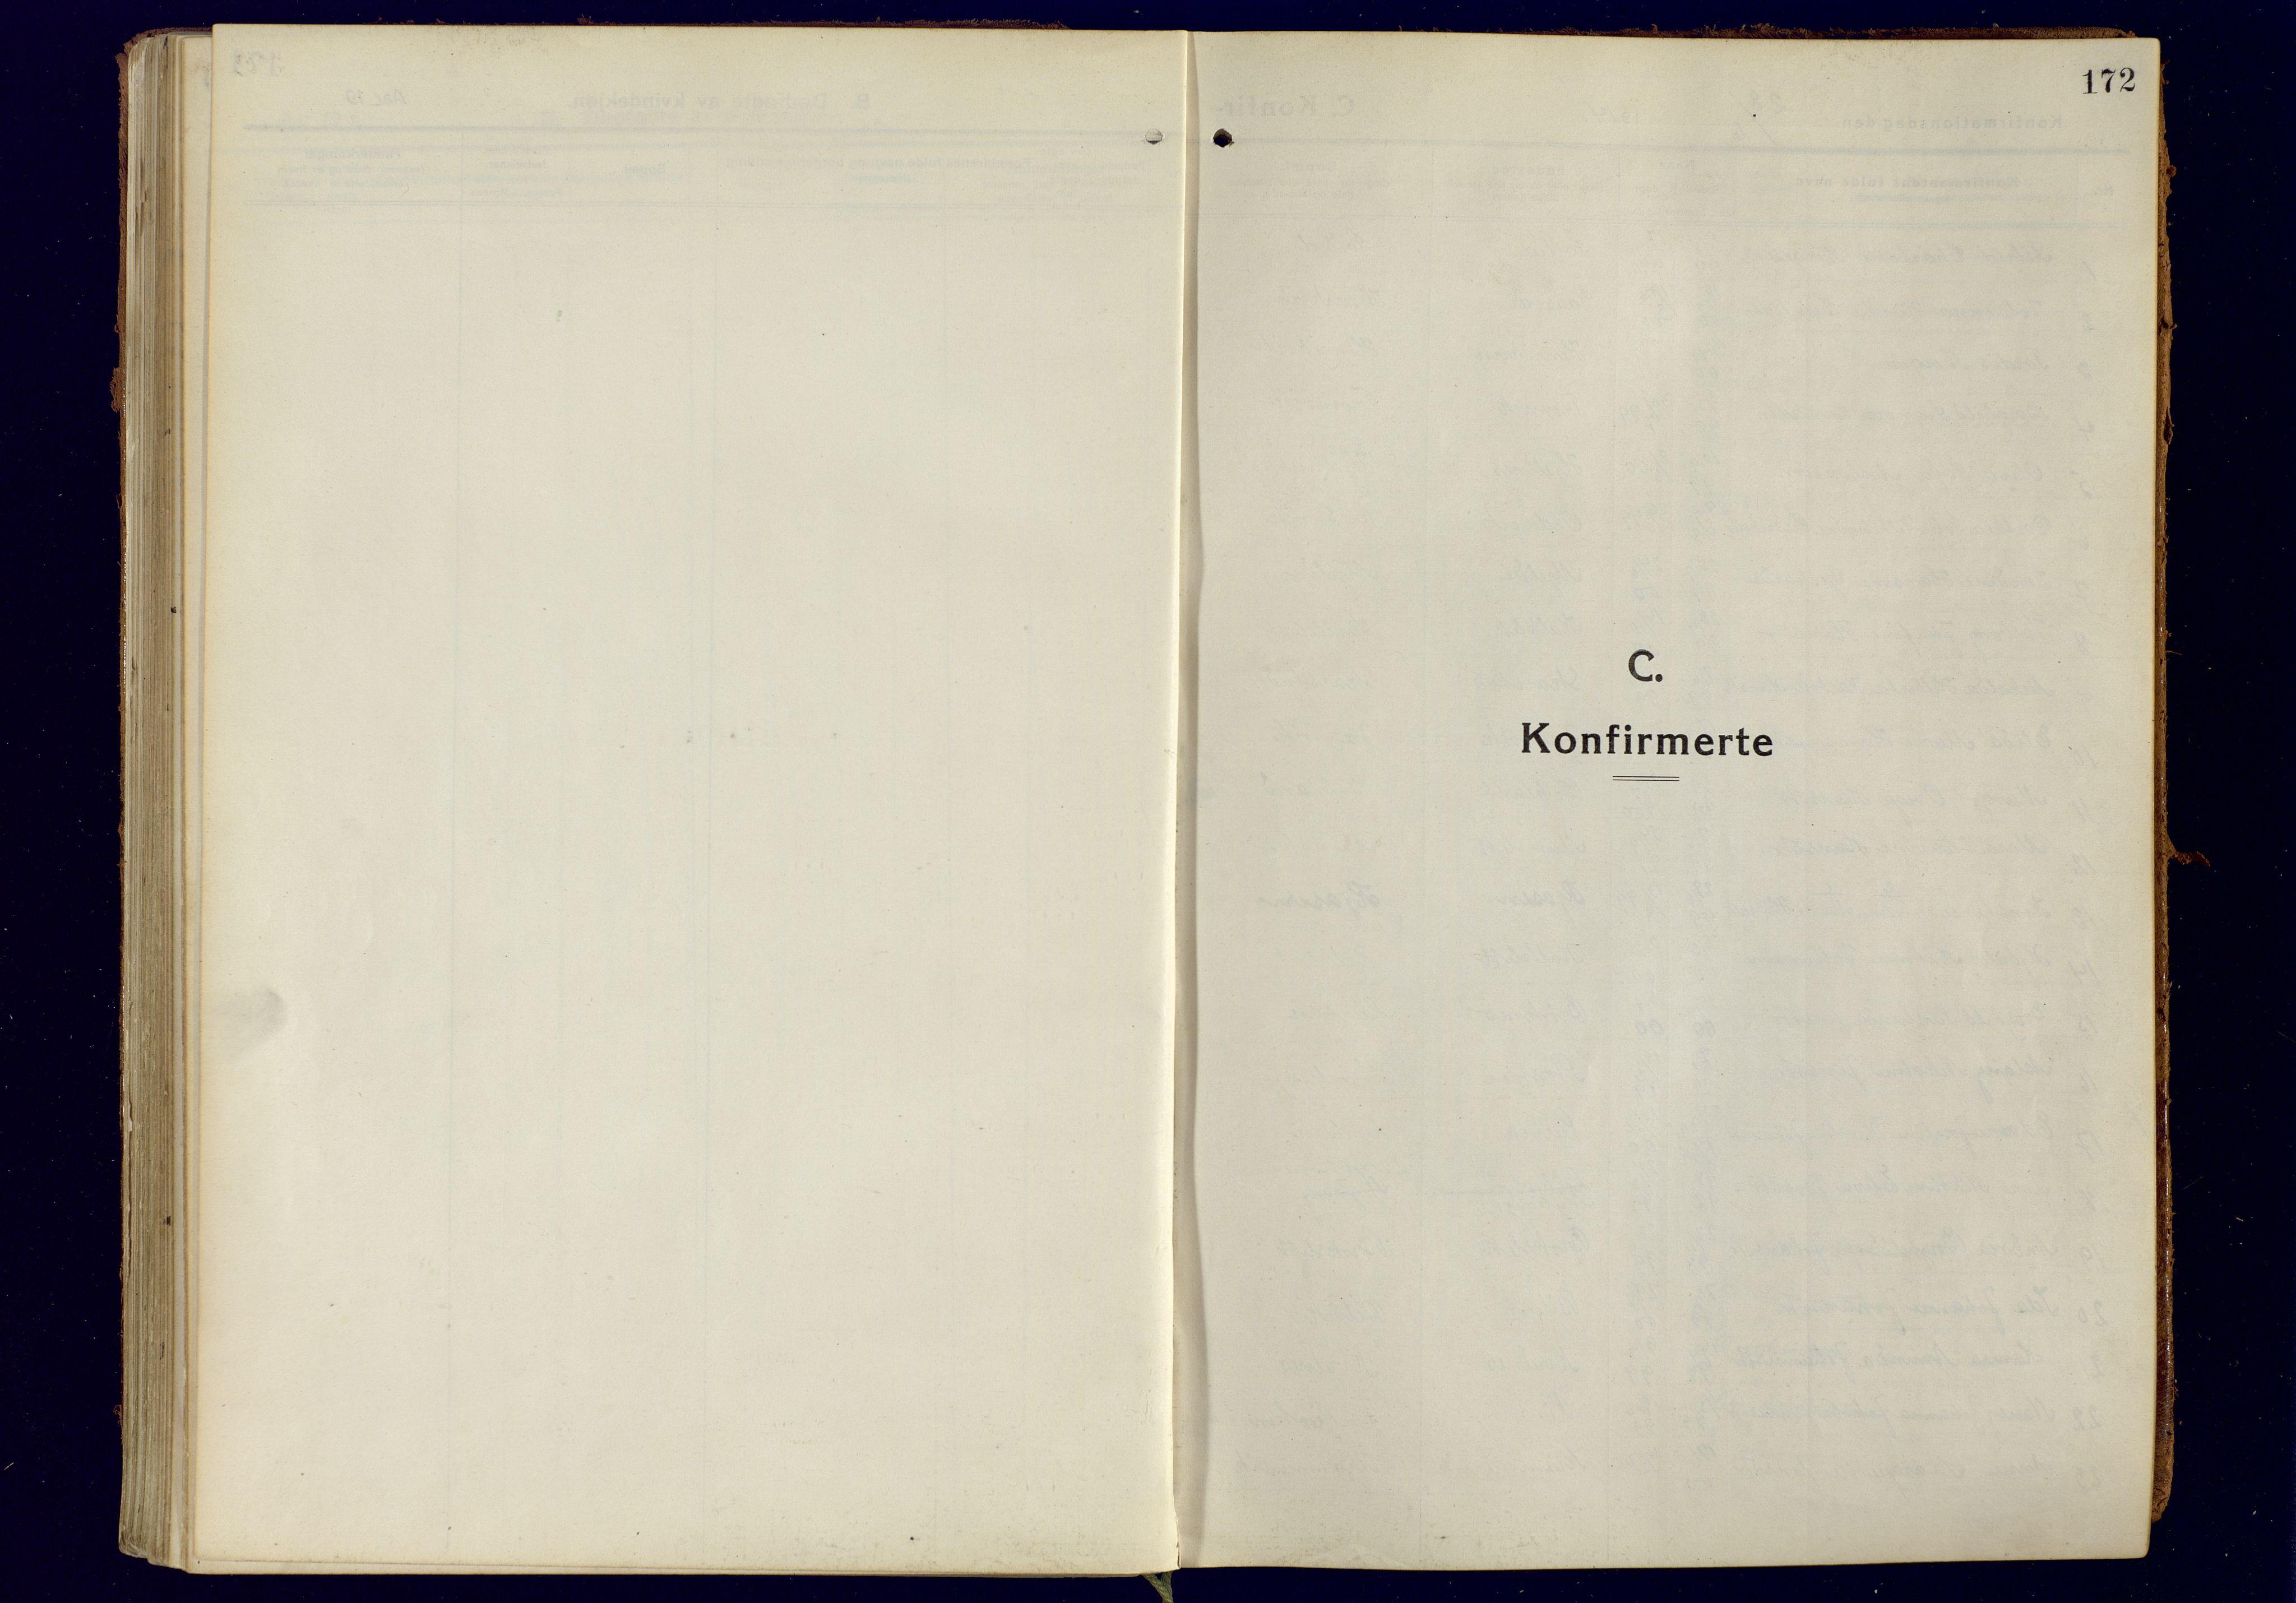 SATØ, Tromsøysund sokneprestkontor, G/Ga: Ministerialbok nr. 8, 1914-1922, s. 172